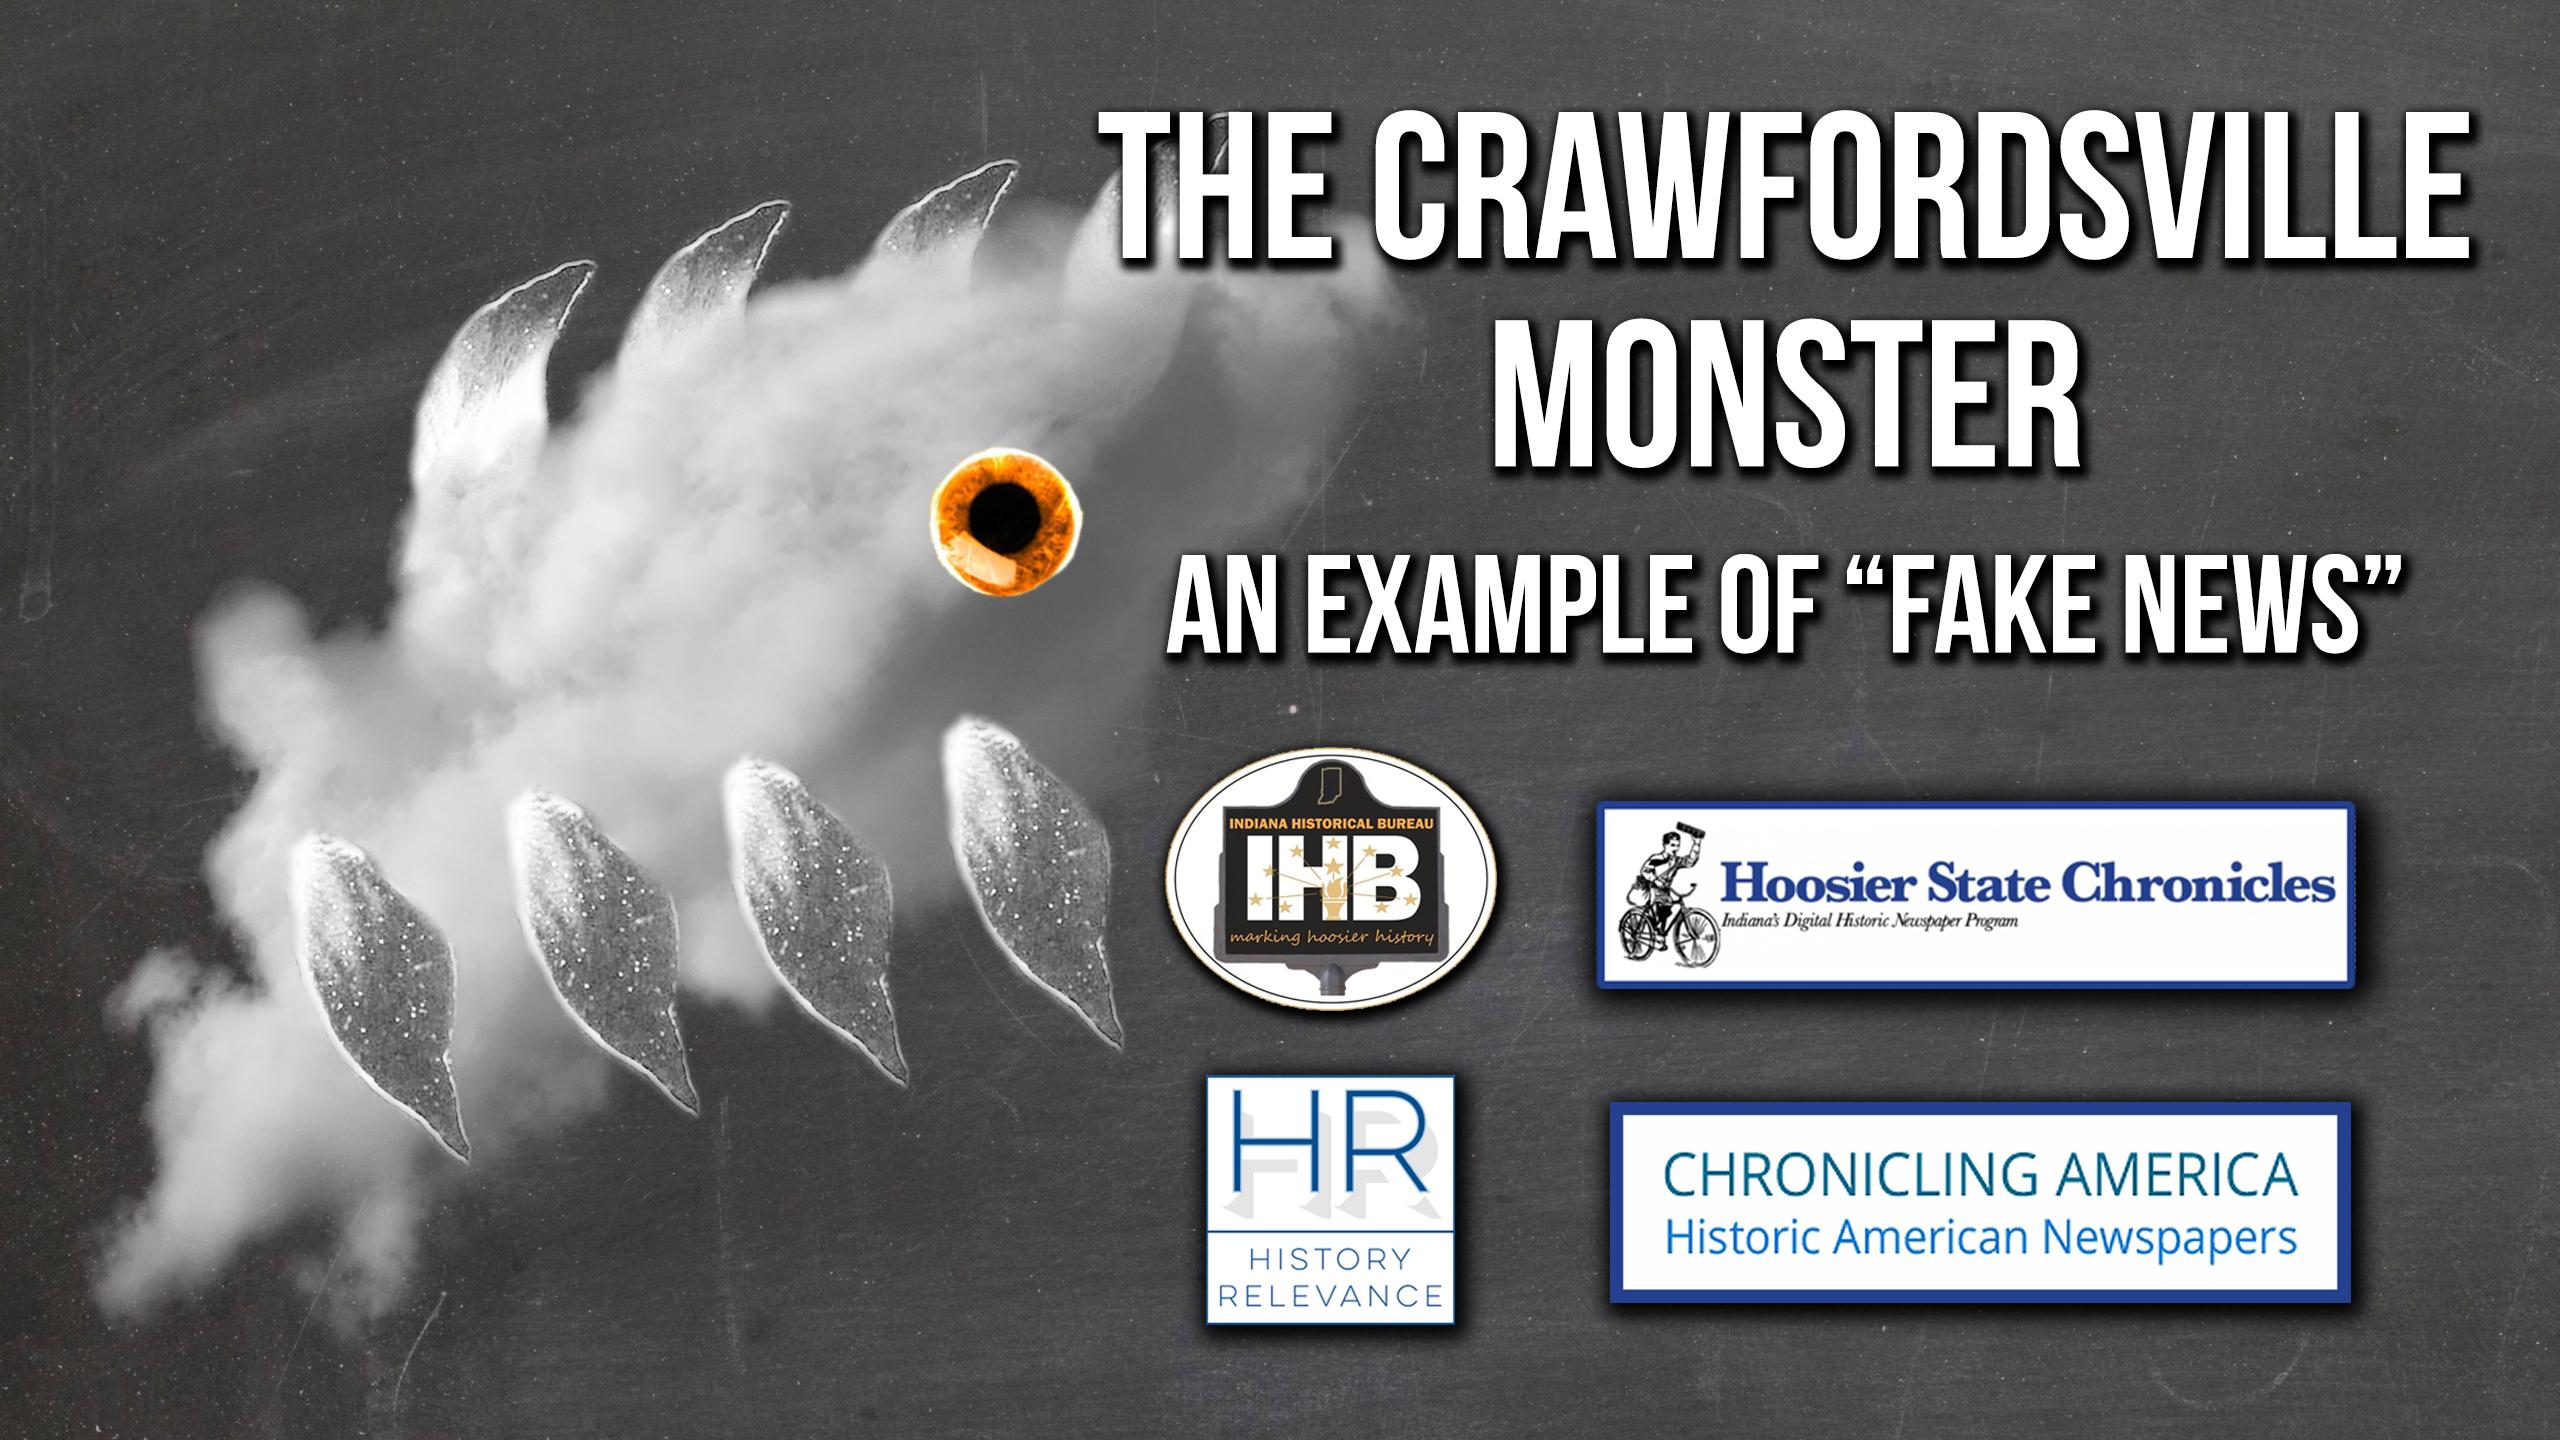 The Crawfordsville Monster An Example Of Fake News Hoosier